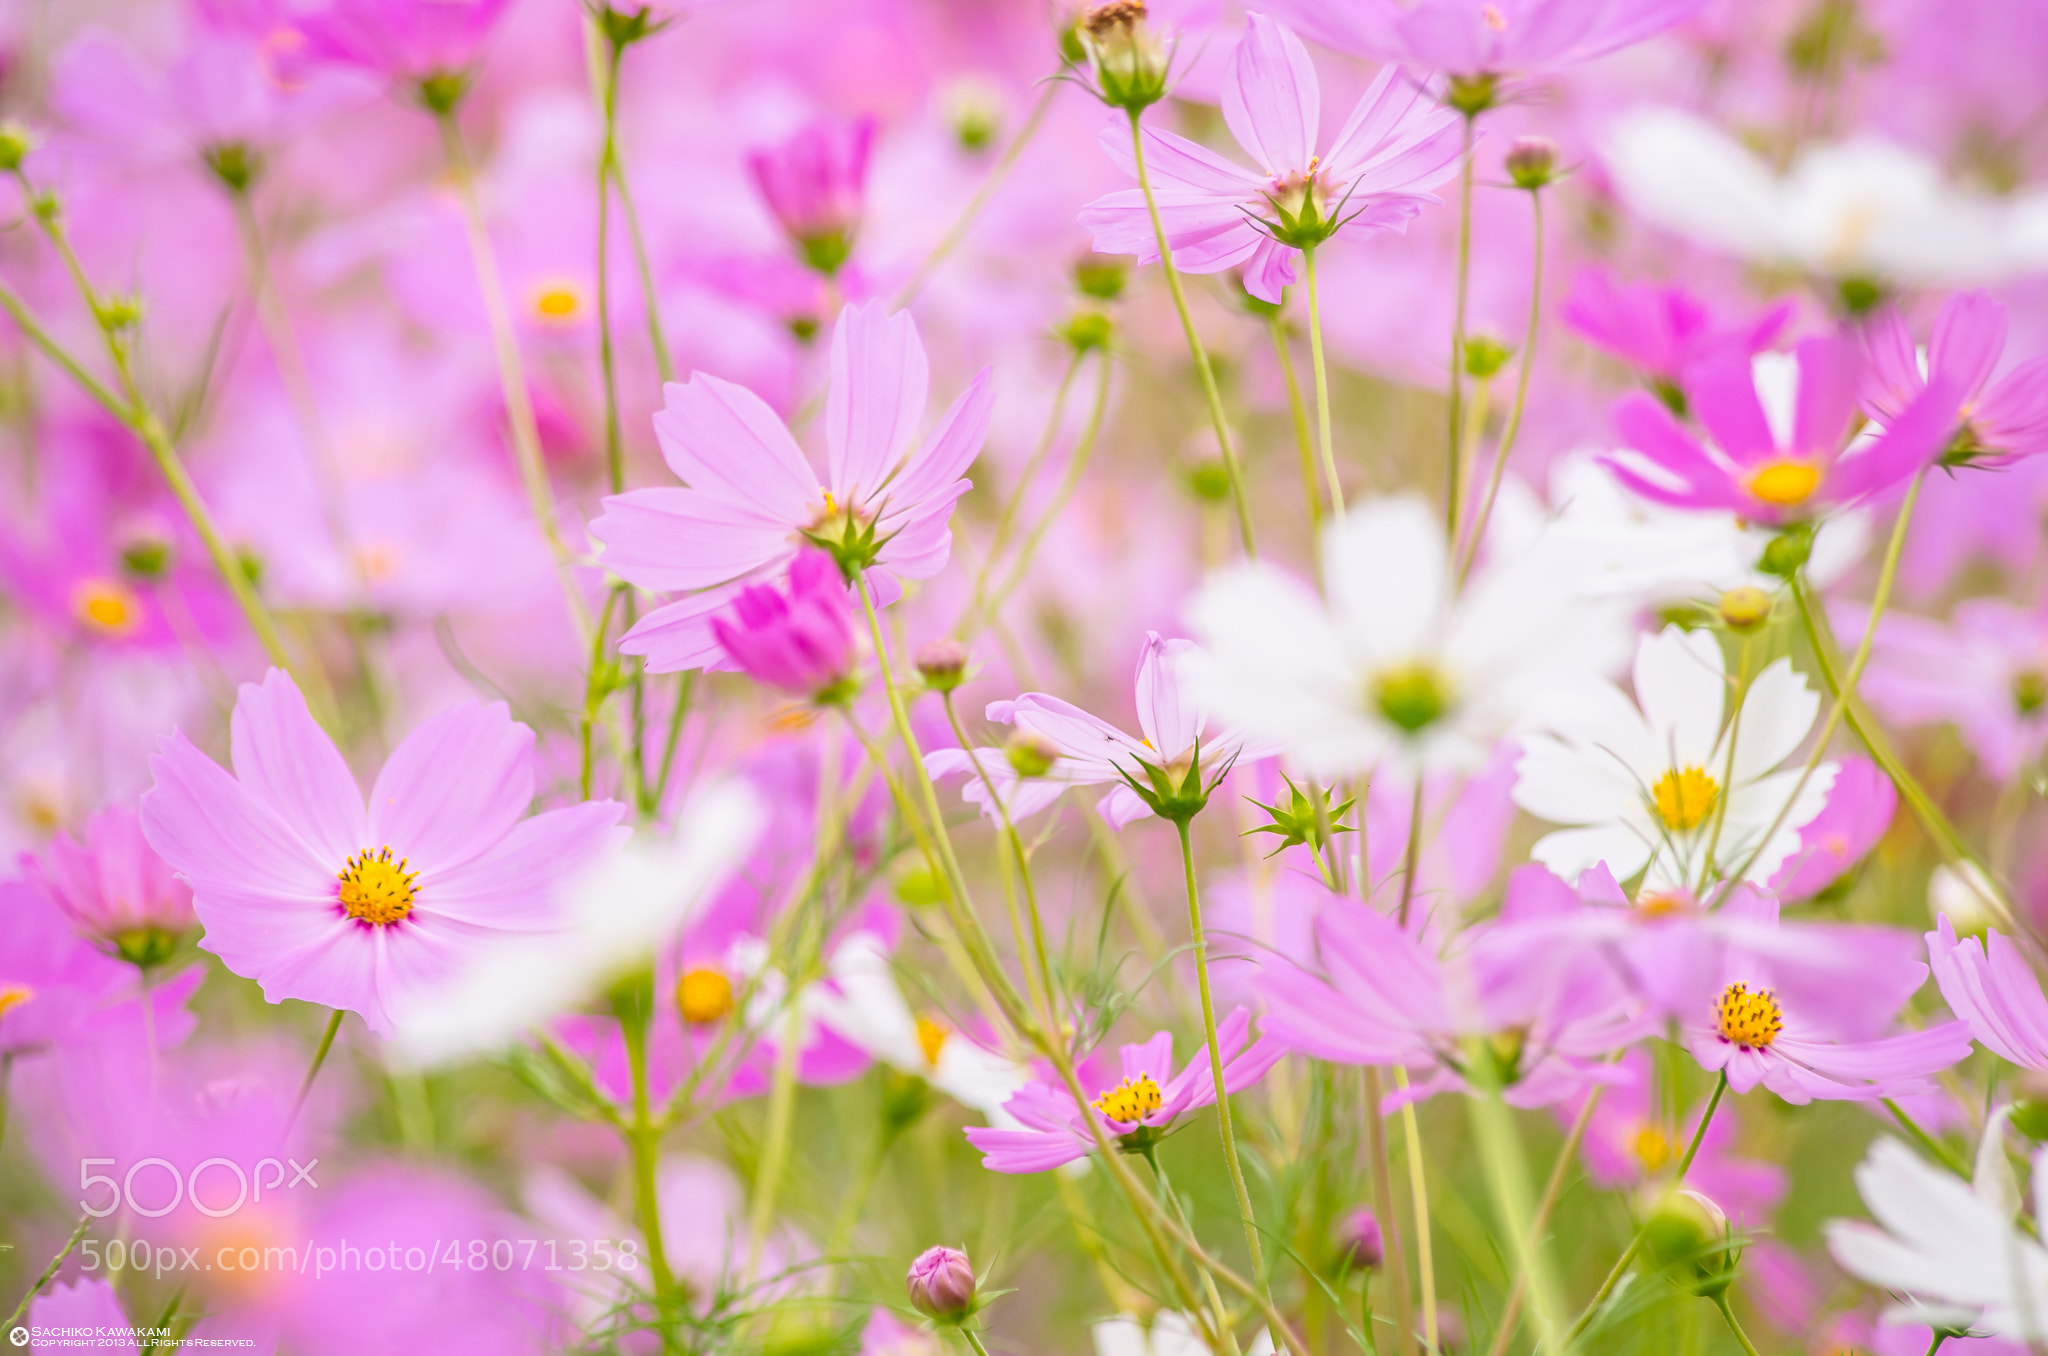 Photograph 愛情 by Sachiko Kawakami on 500px